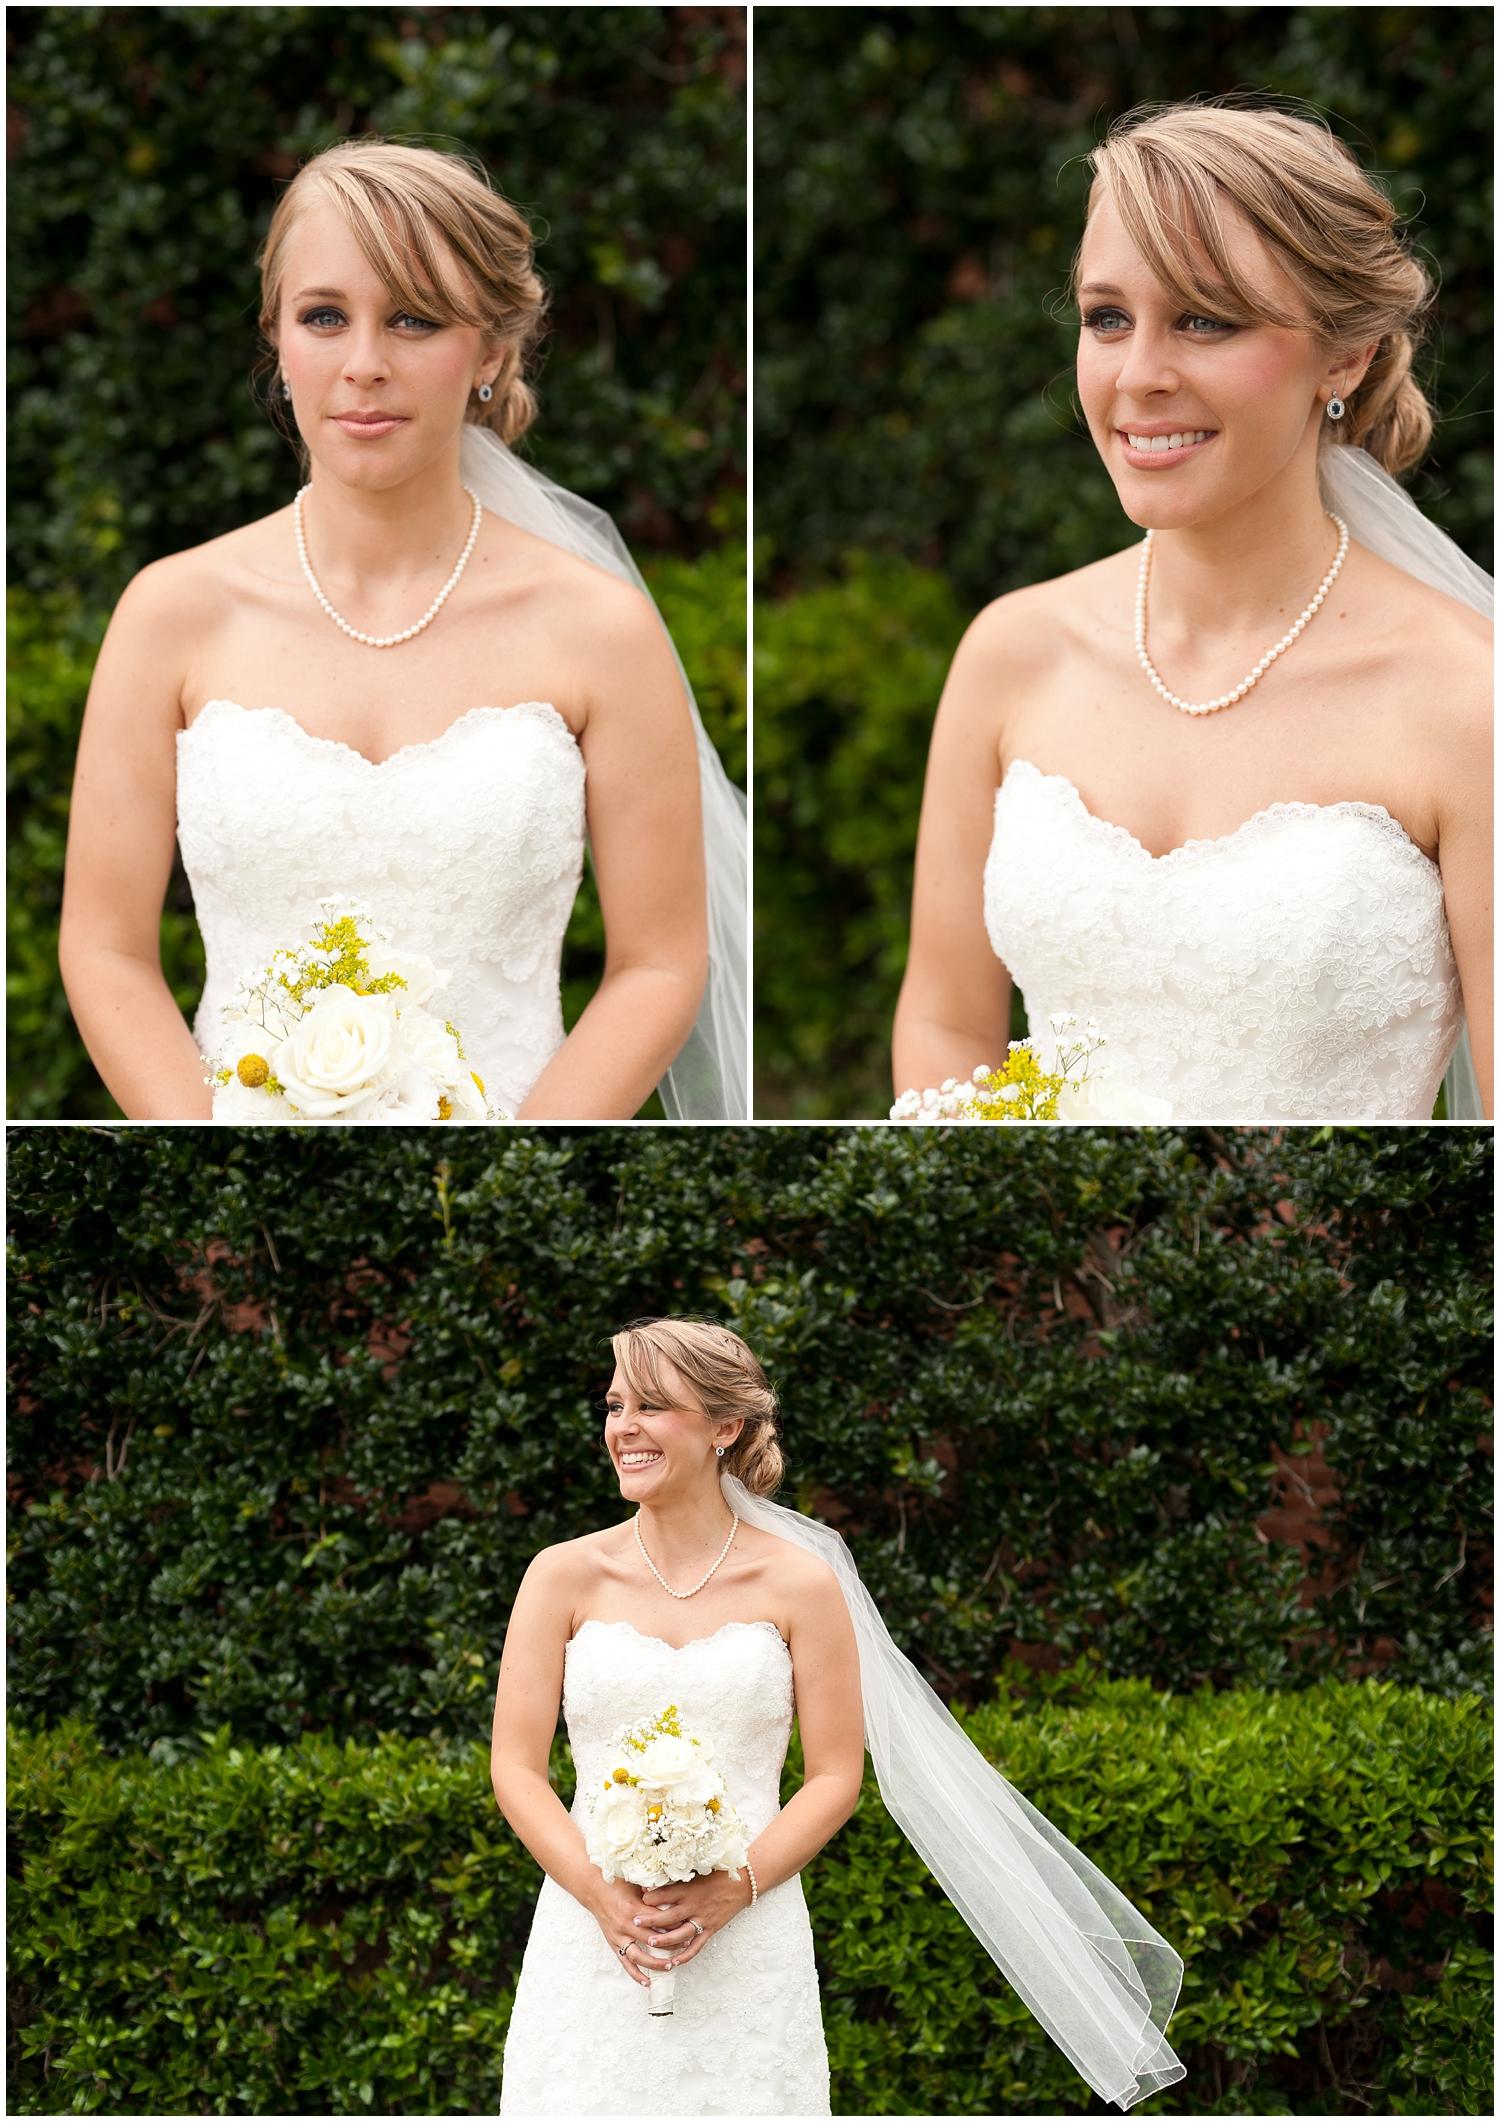 BloomandLo_PeteandAshley_Smithonia_Farm_Wedding_Blog_0017.jpg